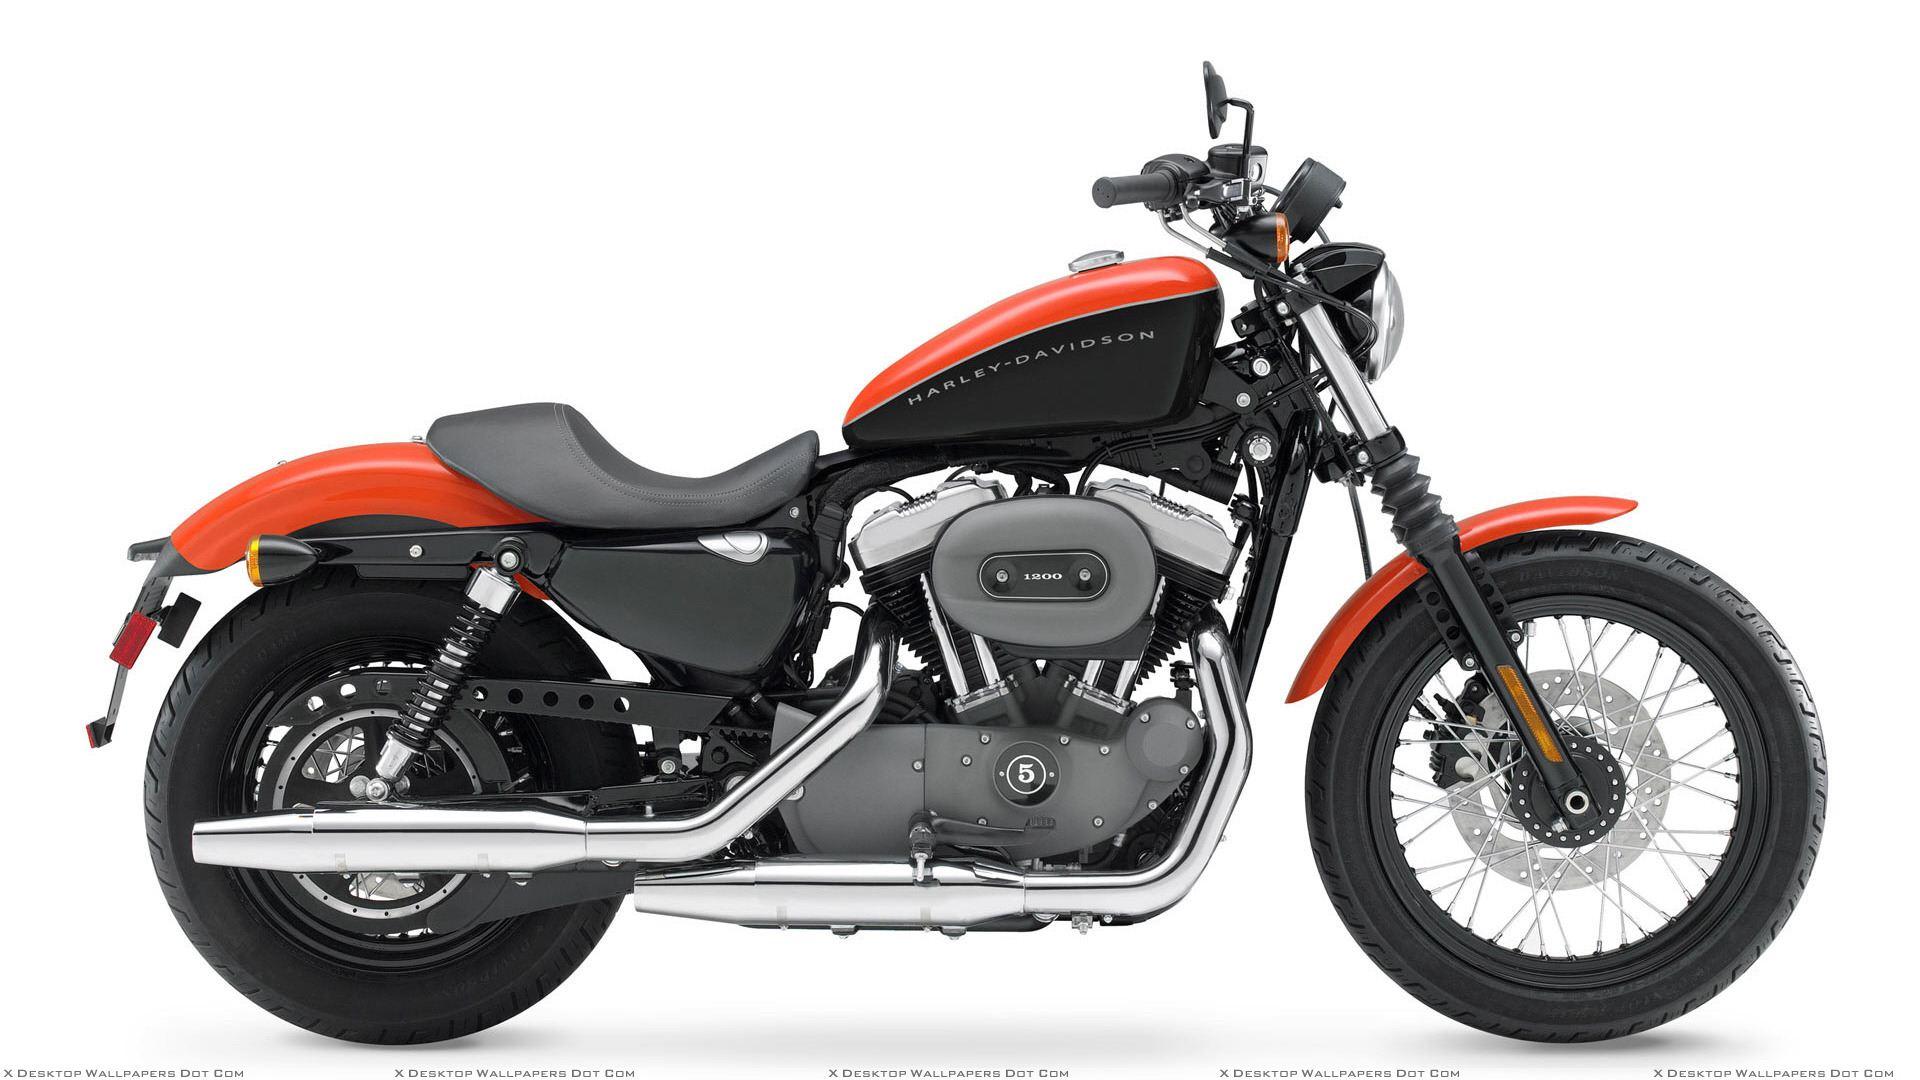 Harley Davidson Sportster Wallpaper 7240 Hd Wallpapers in Bikes 1920x1080